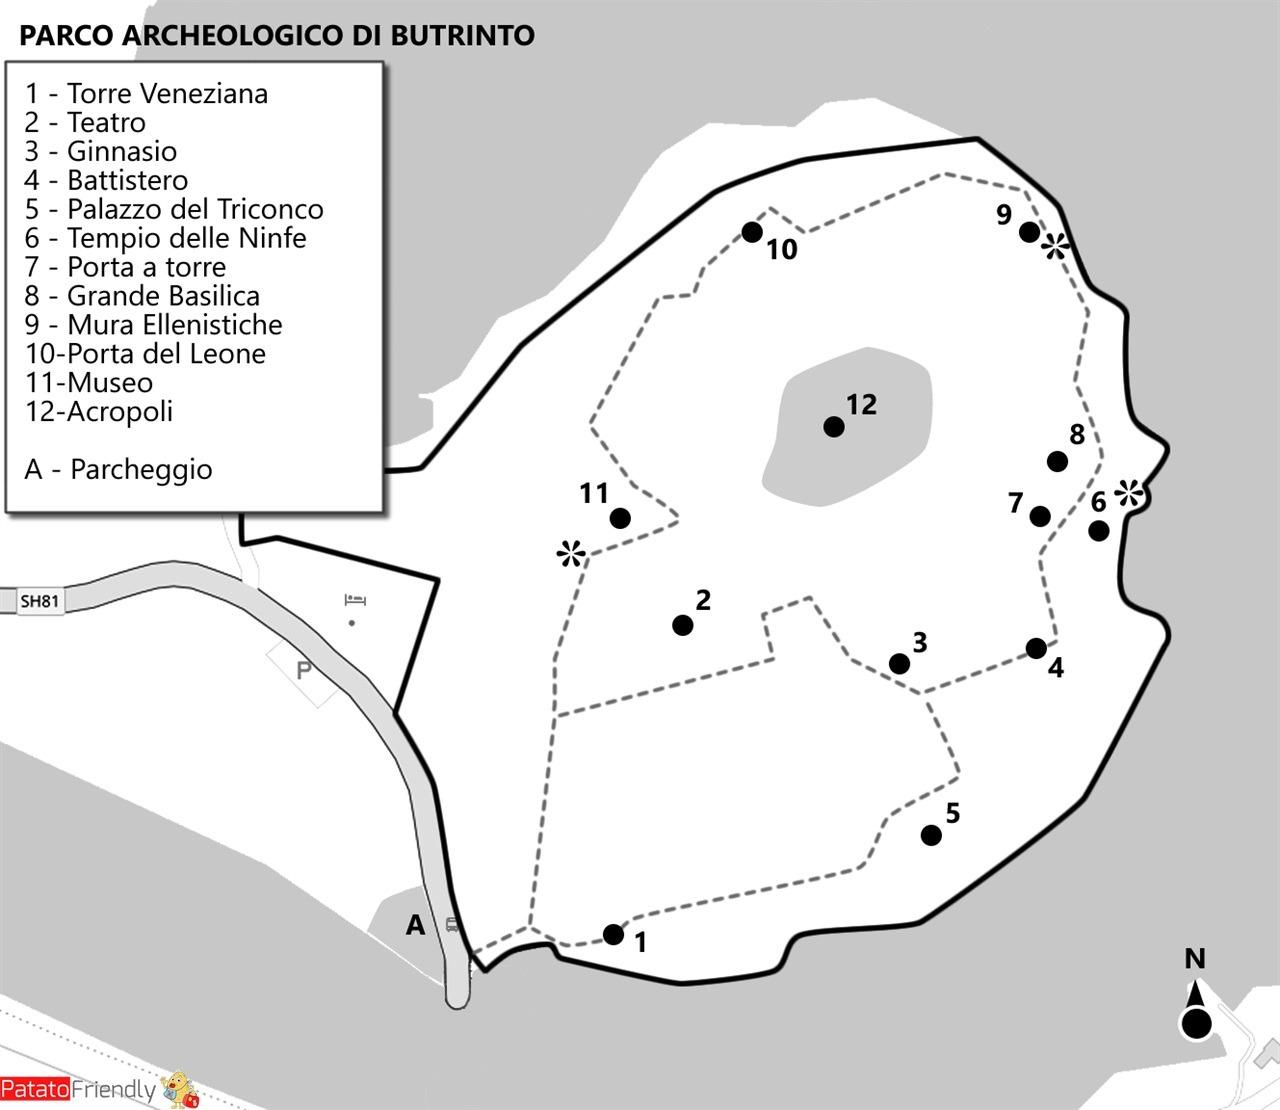 Mappa Parco Archeologico Butrinto - Albania.jpg